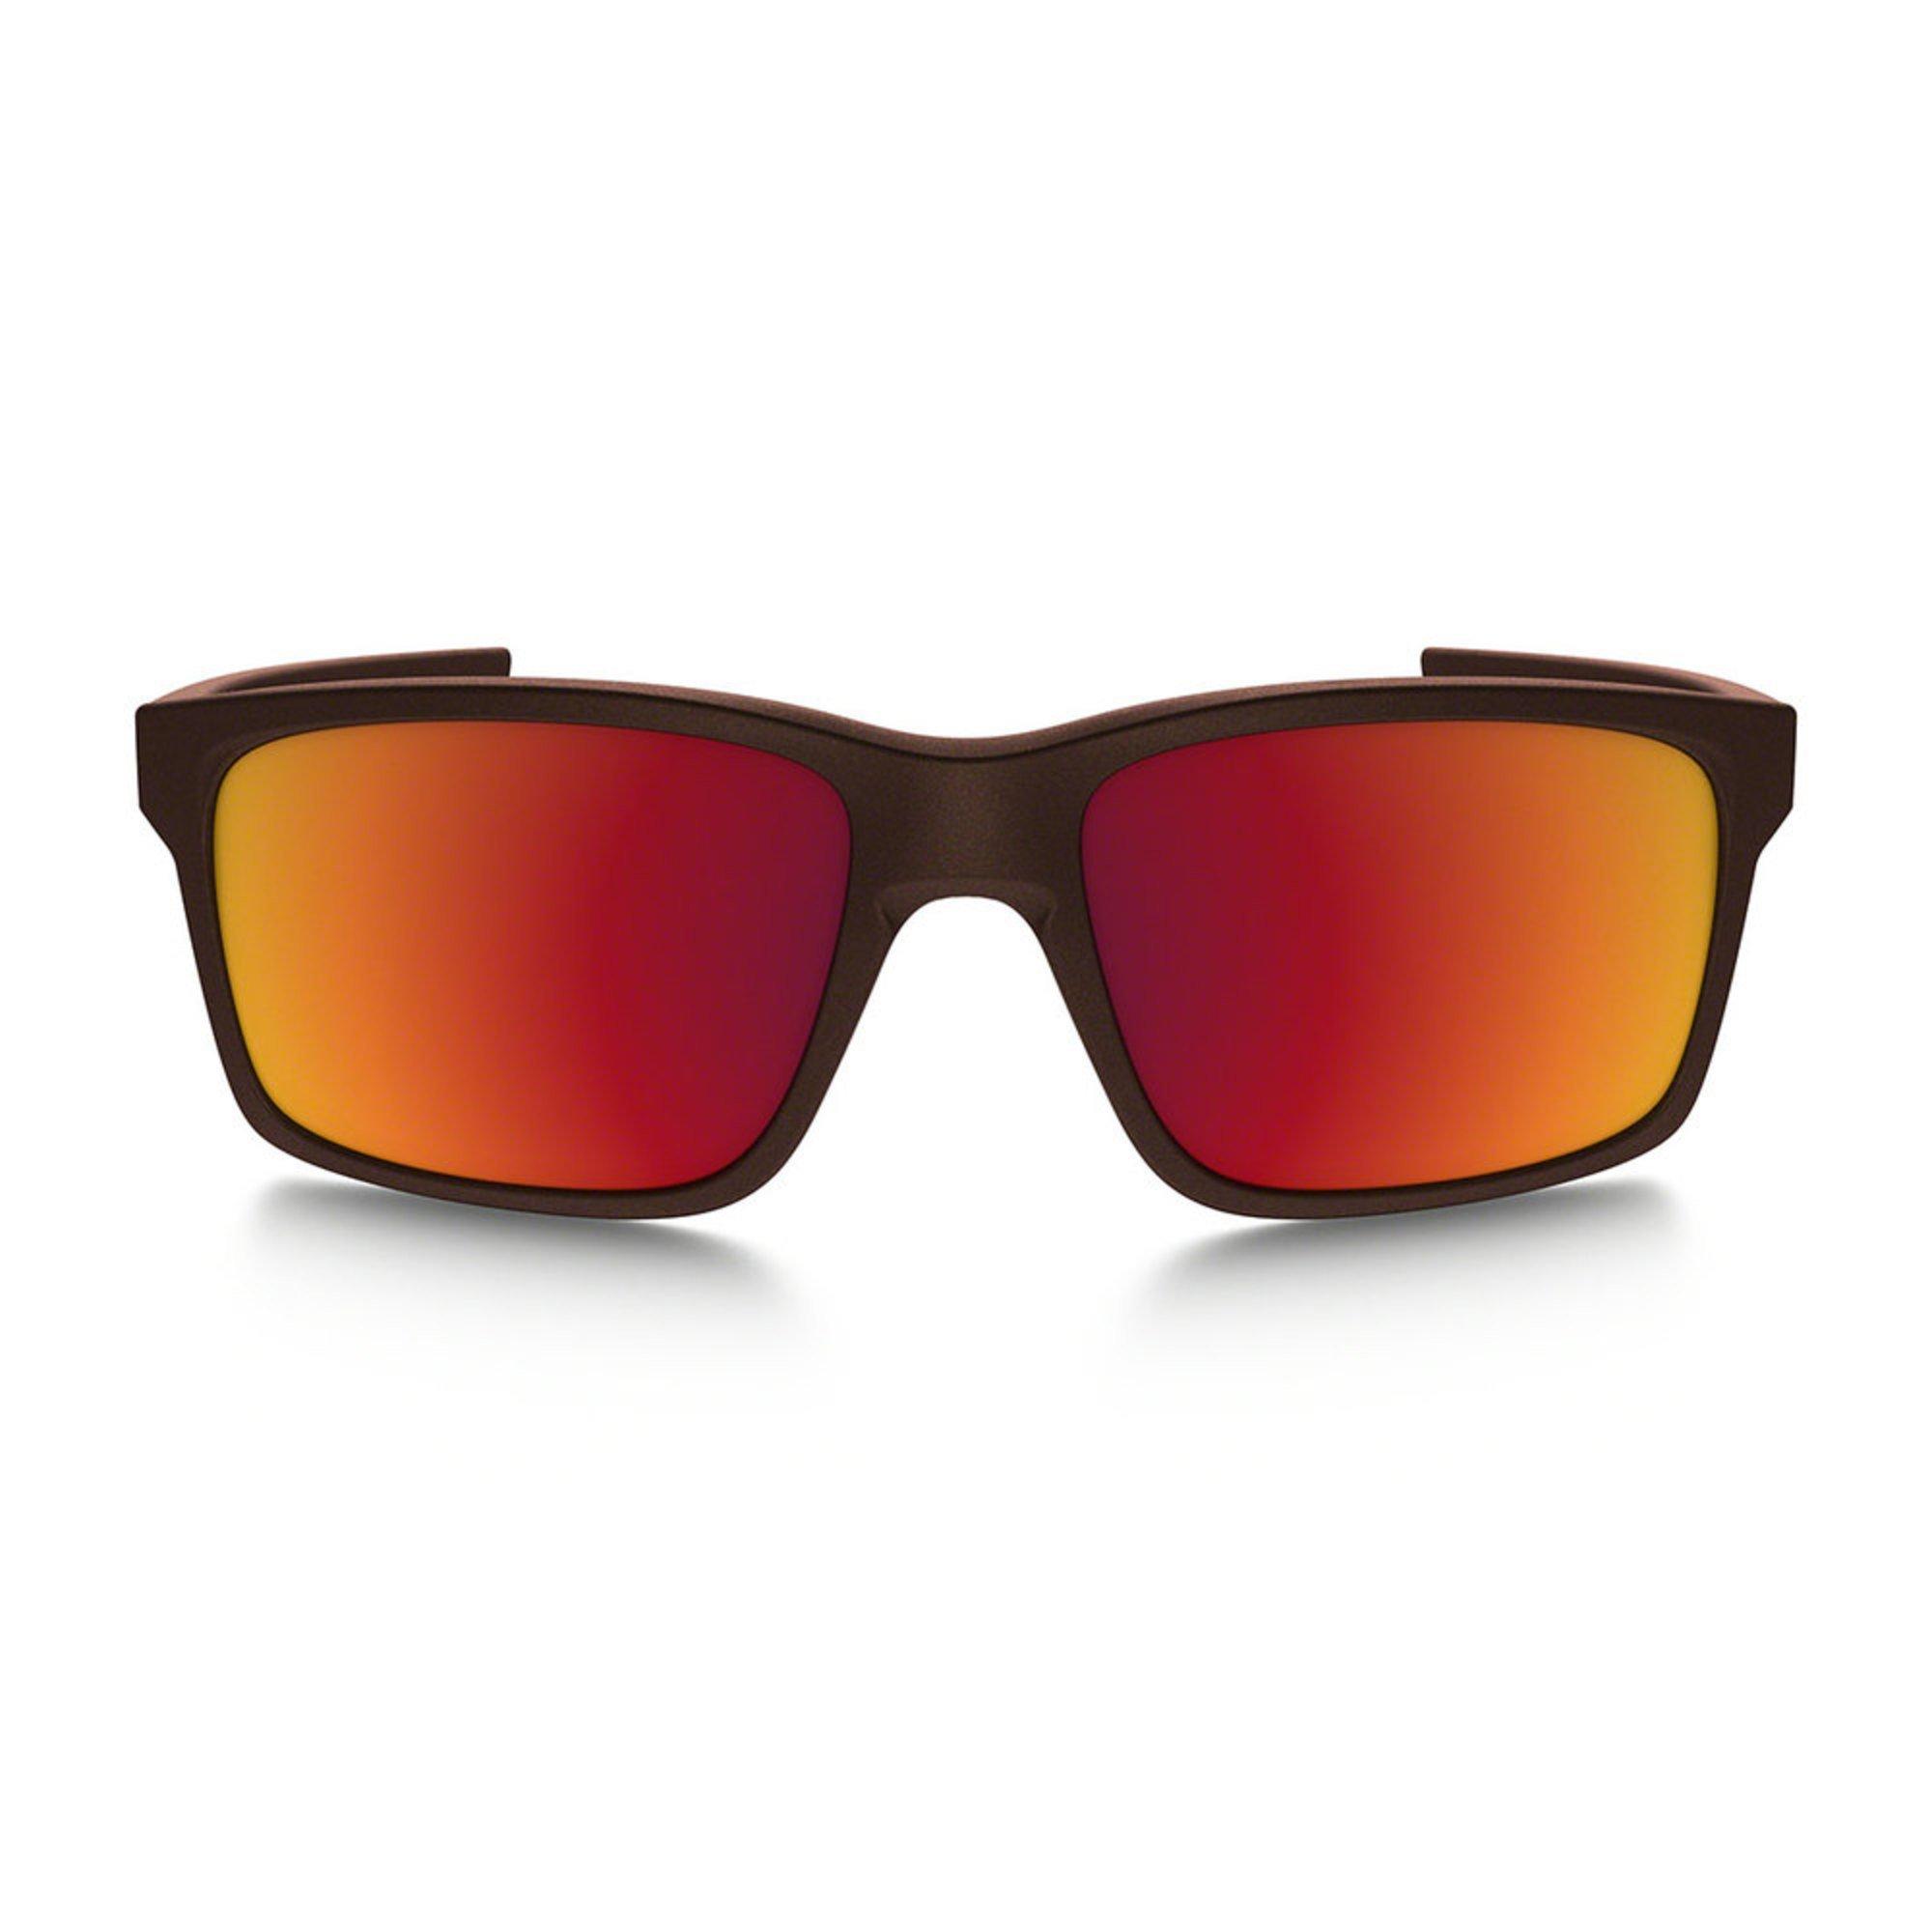 67d6c7a12852 Mens Oakley Sunglasses Clearance